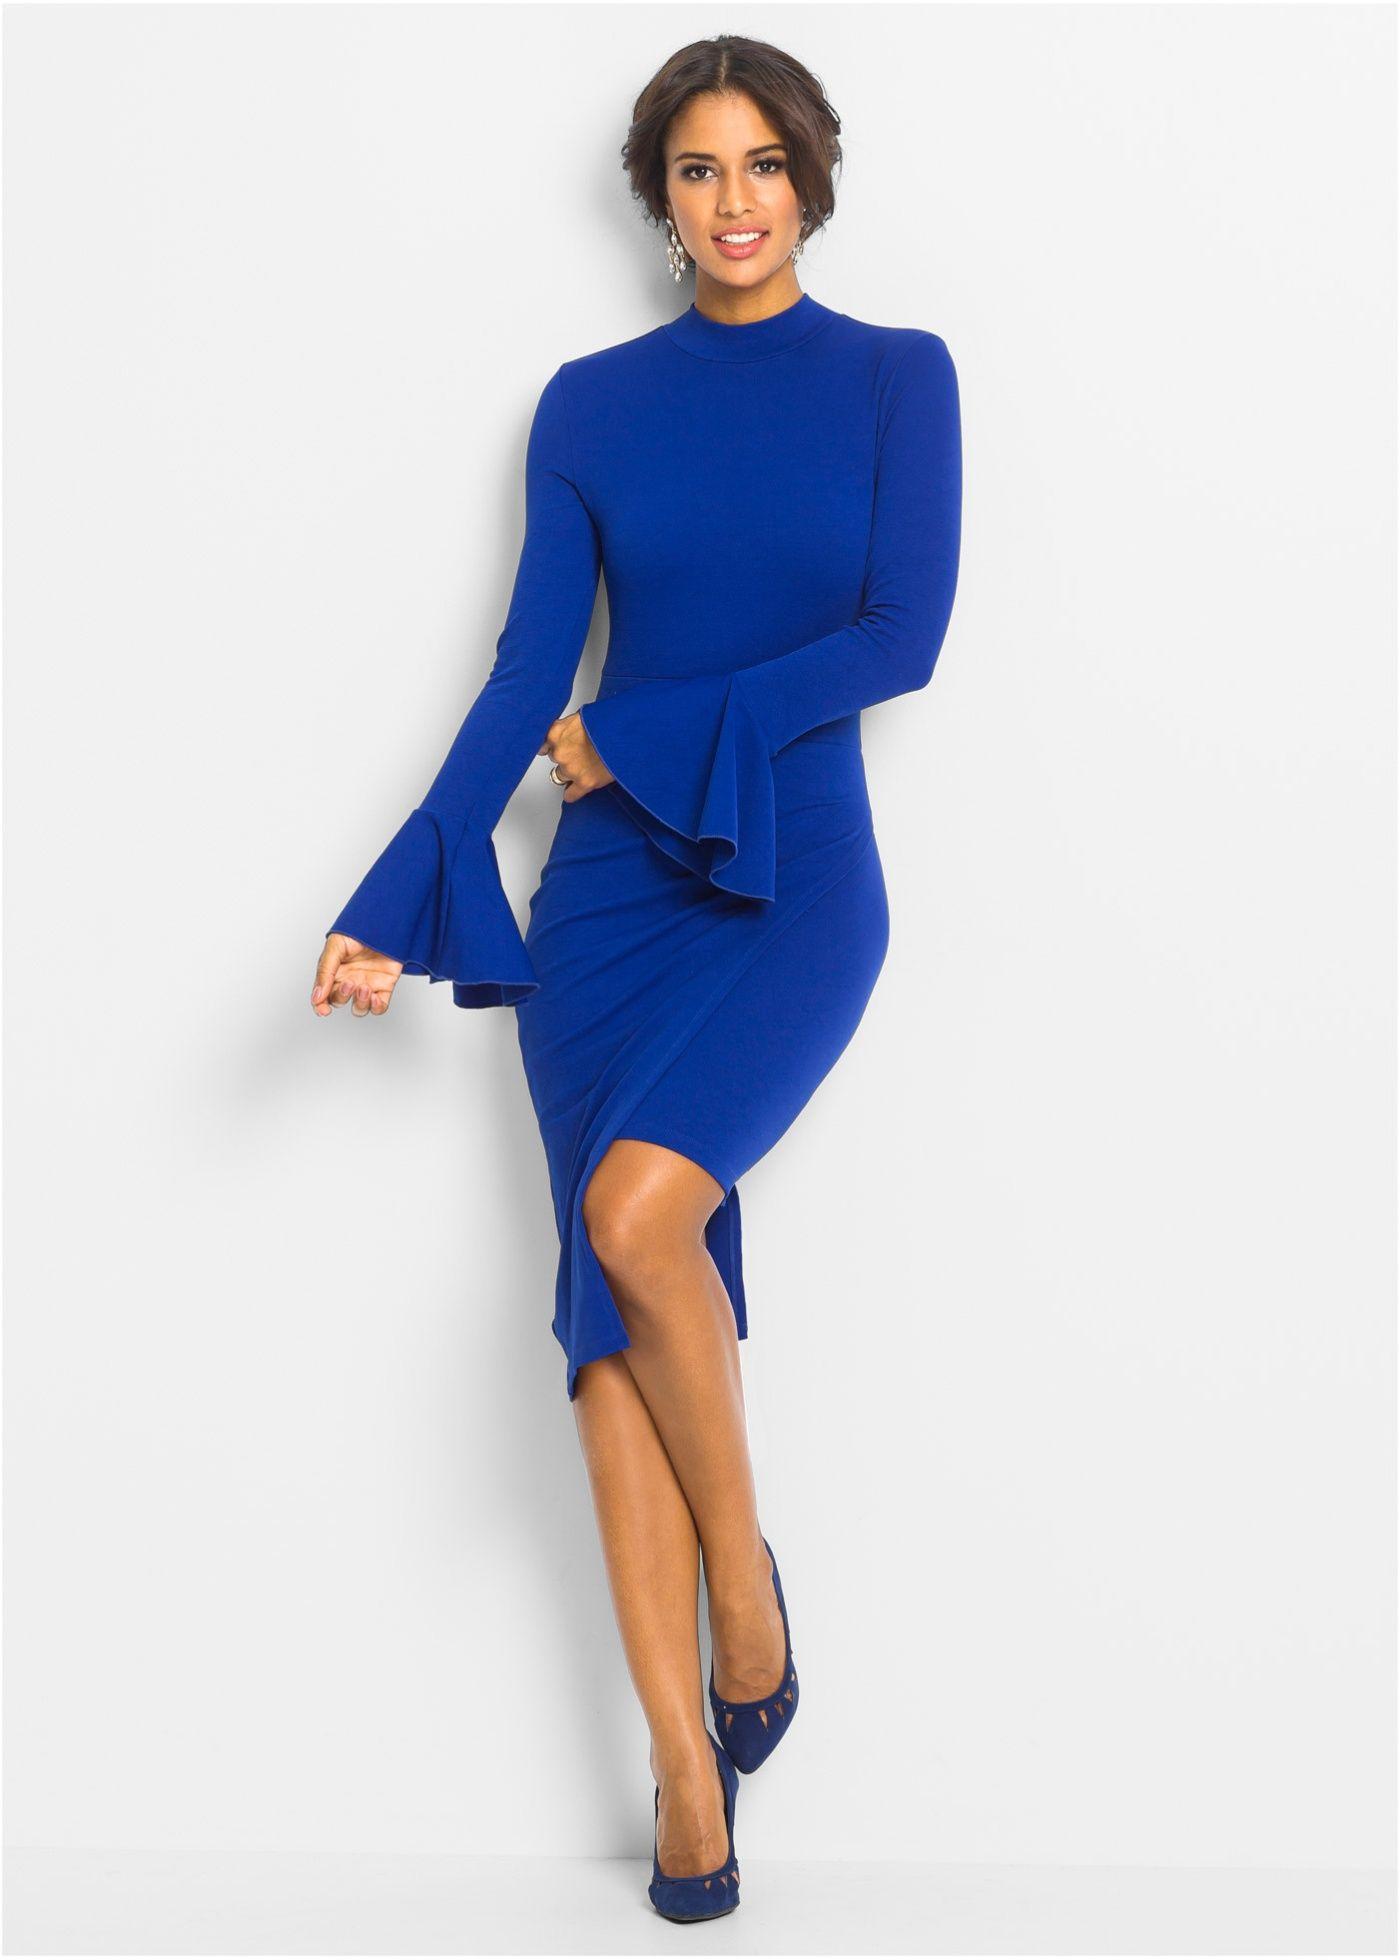 Elegante kleider blau